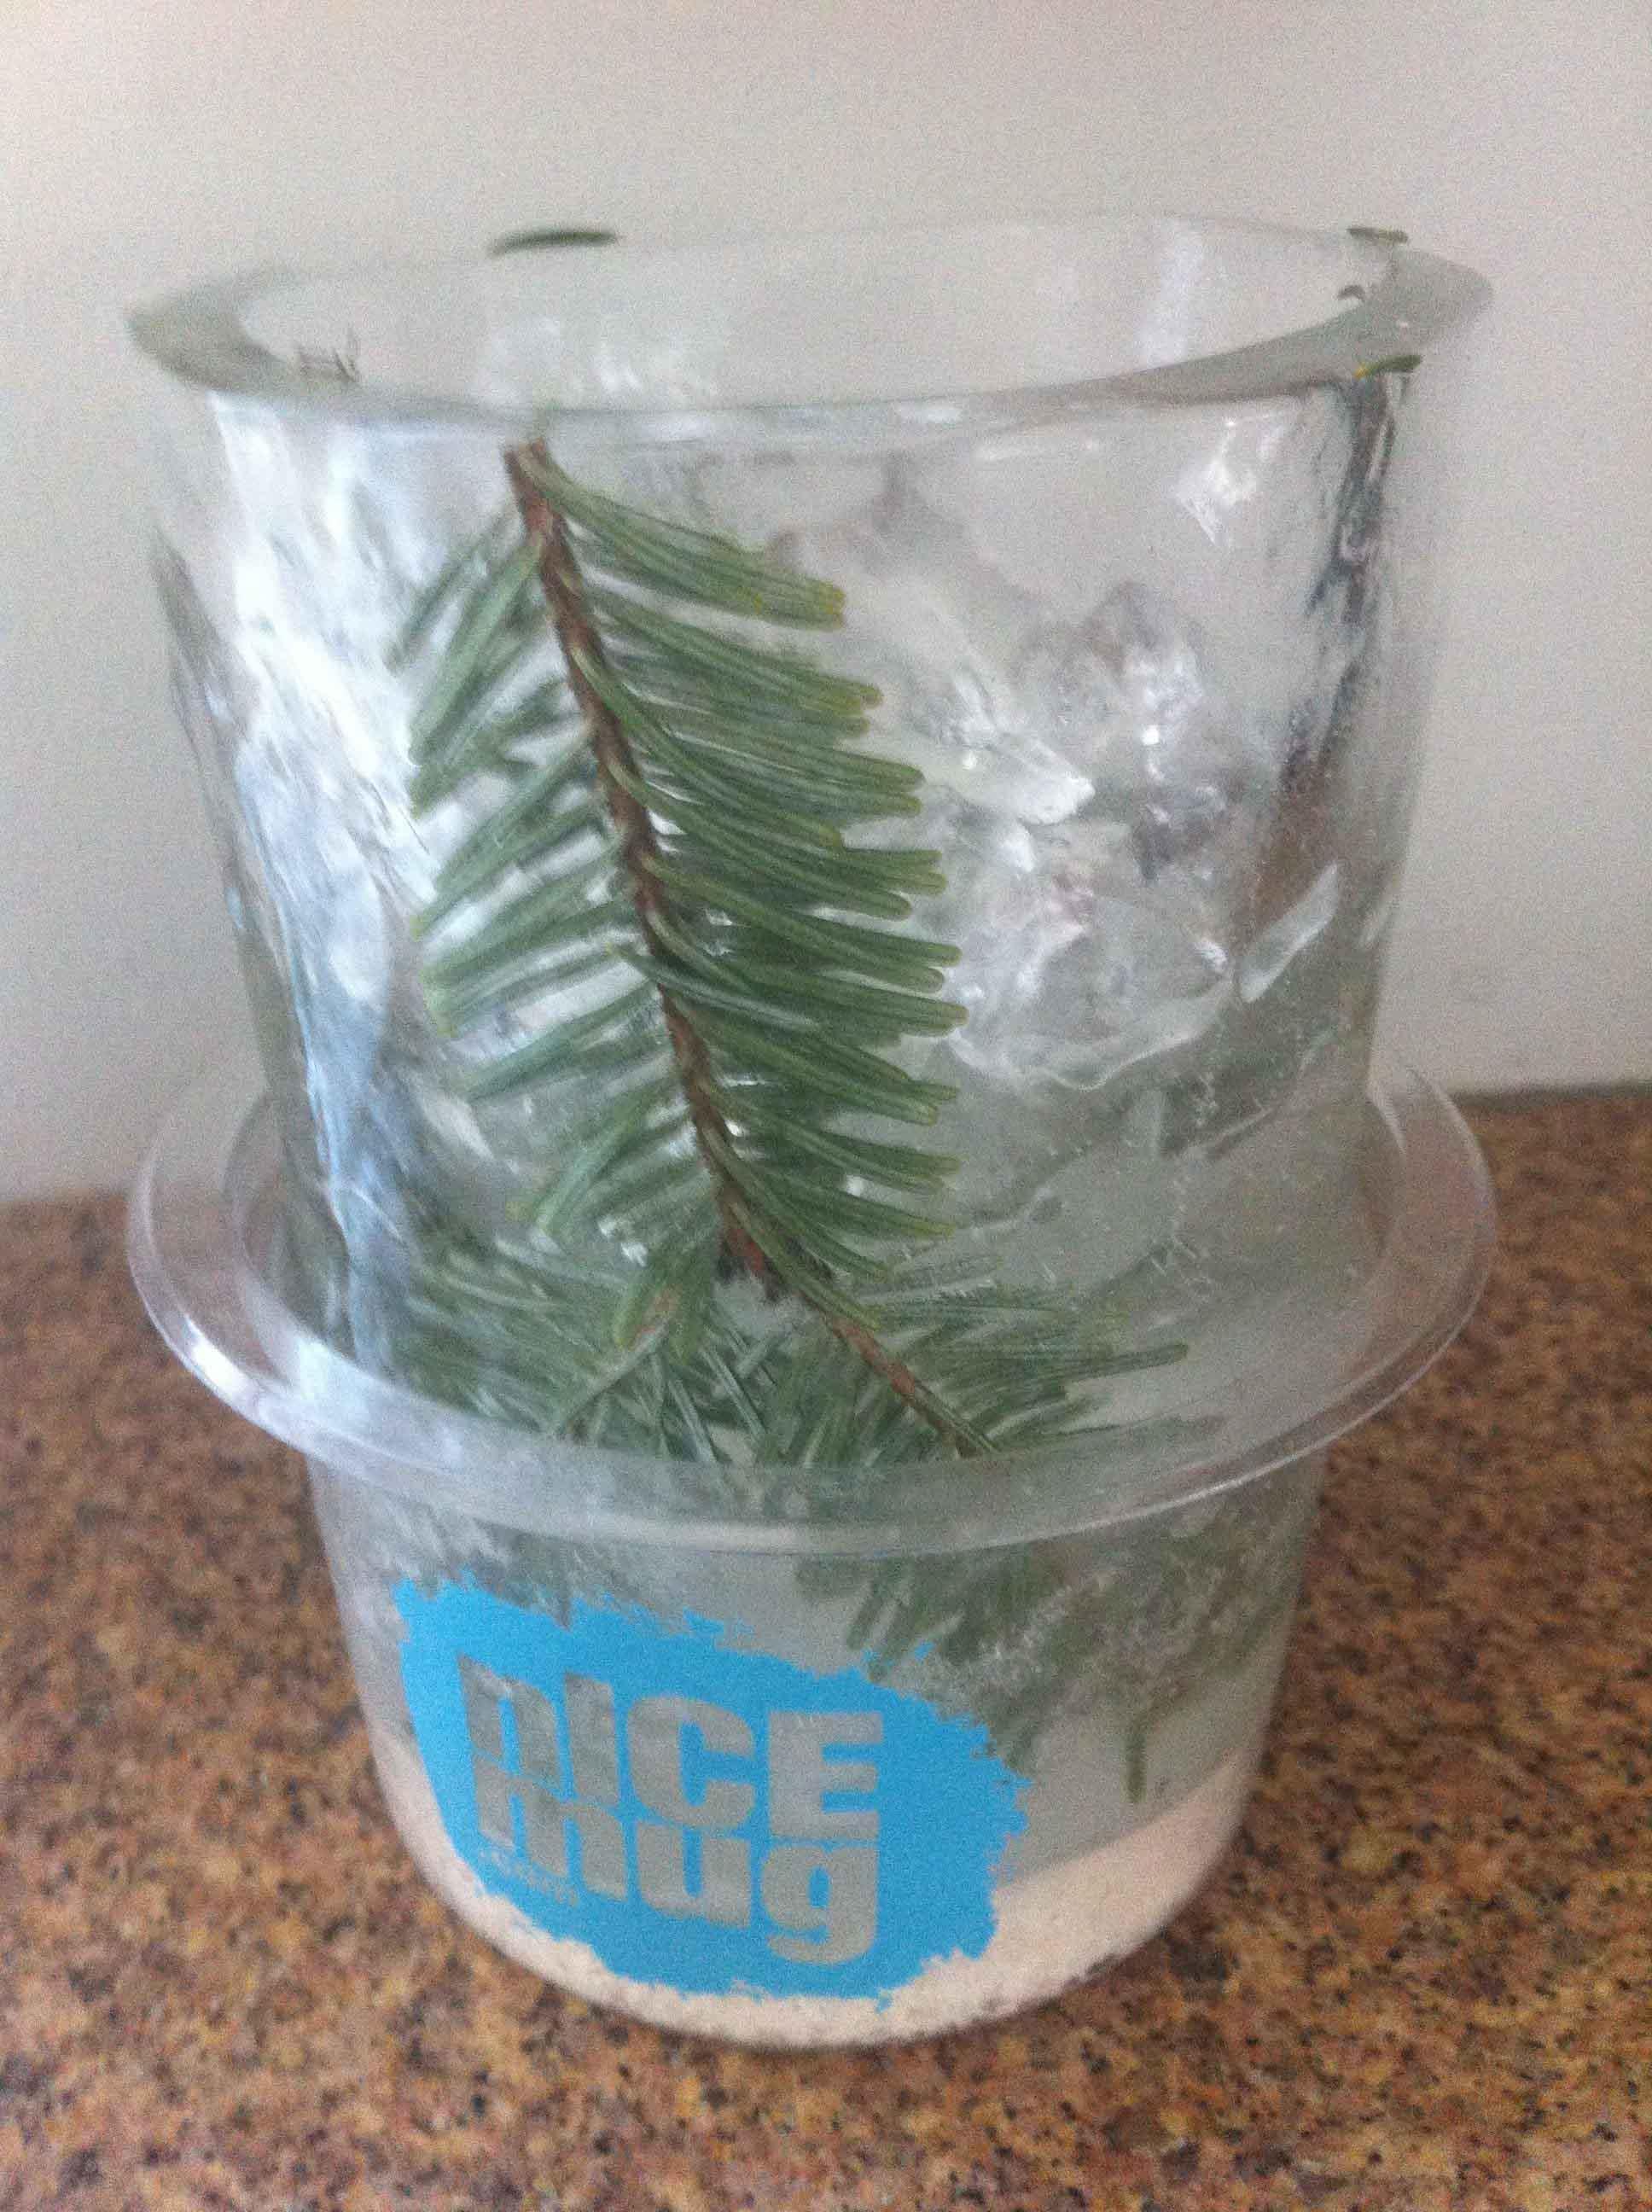 pine clipping nICE mug